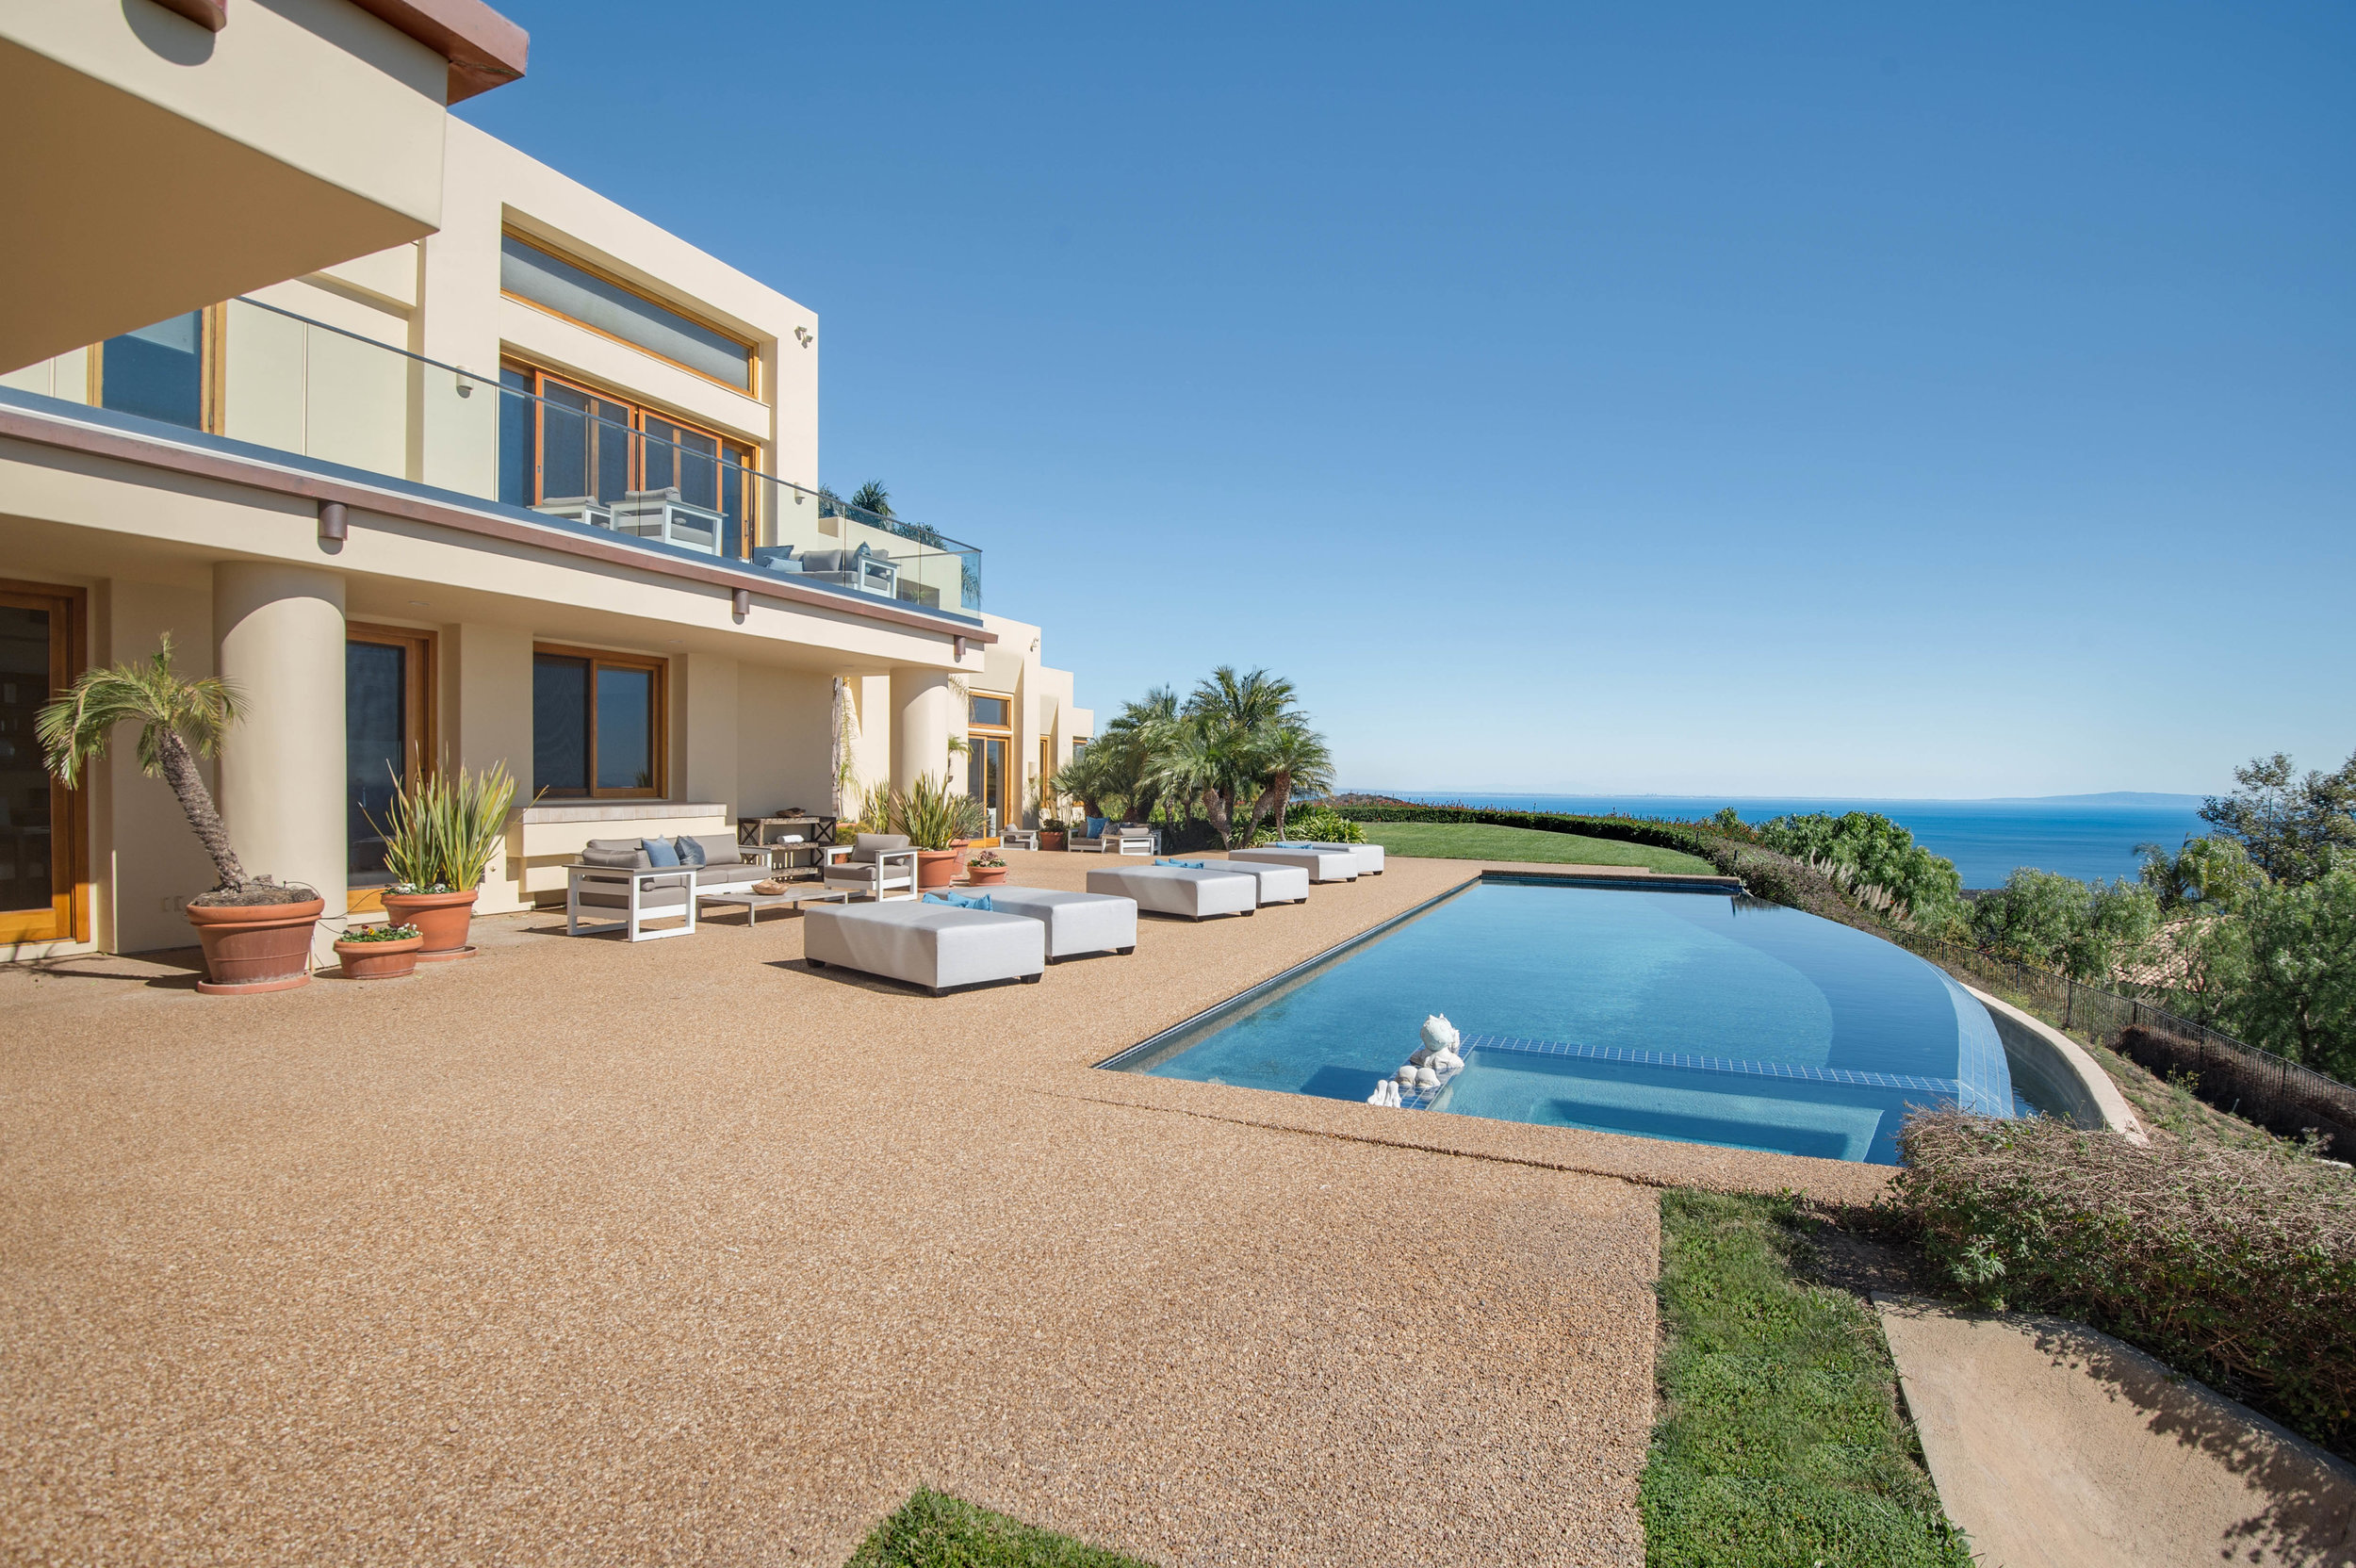 030 Pool Ocean View 27475 Latigo Bay View Drive For Sale Lease The Malibu Life Team Luxury Real Estate.jpg